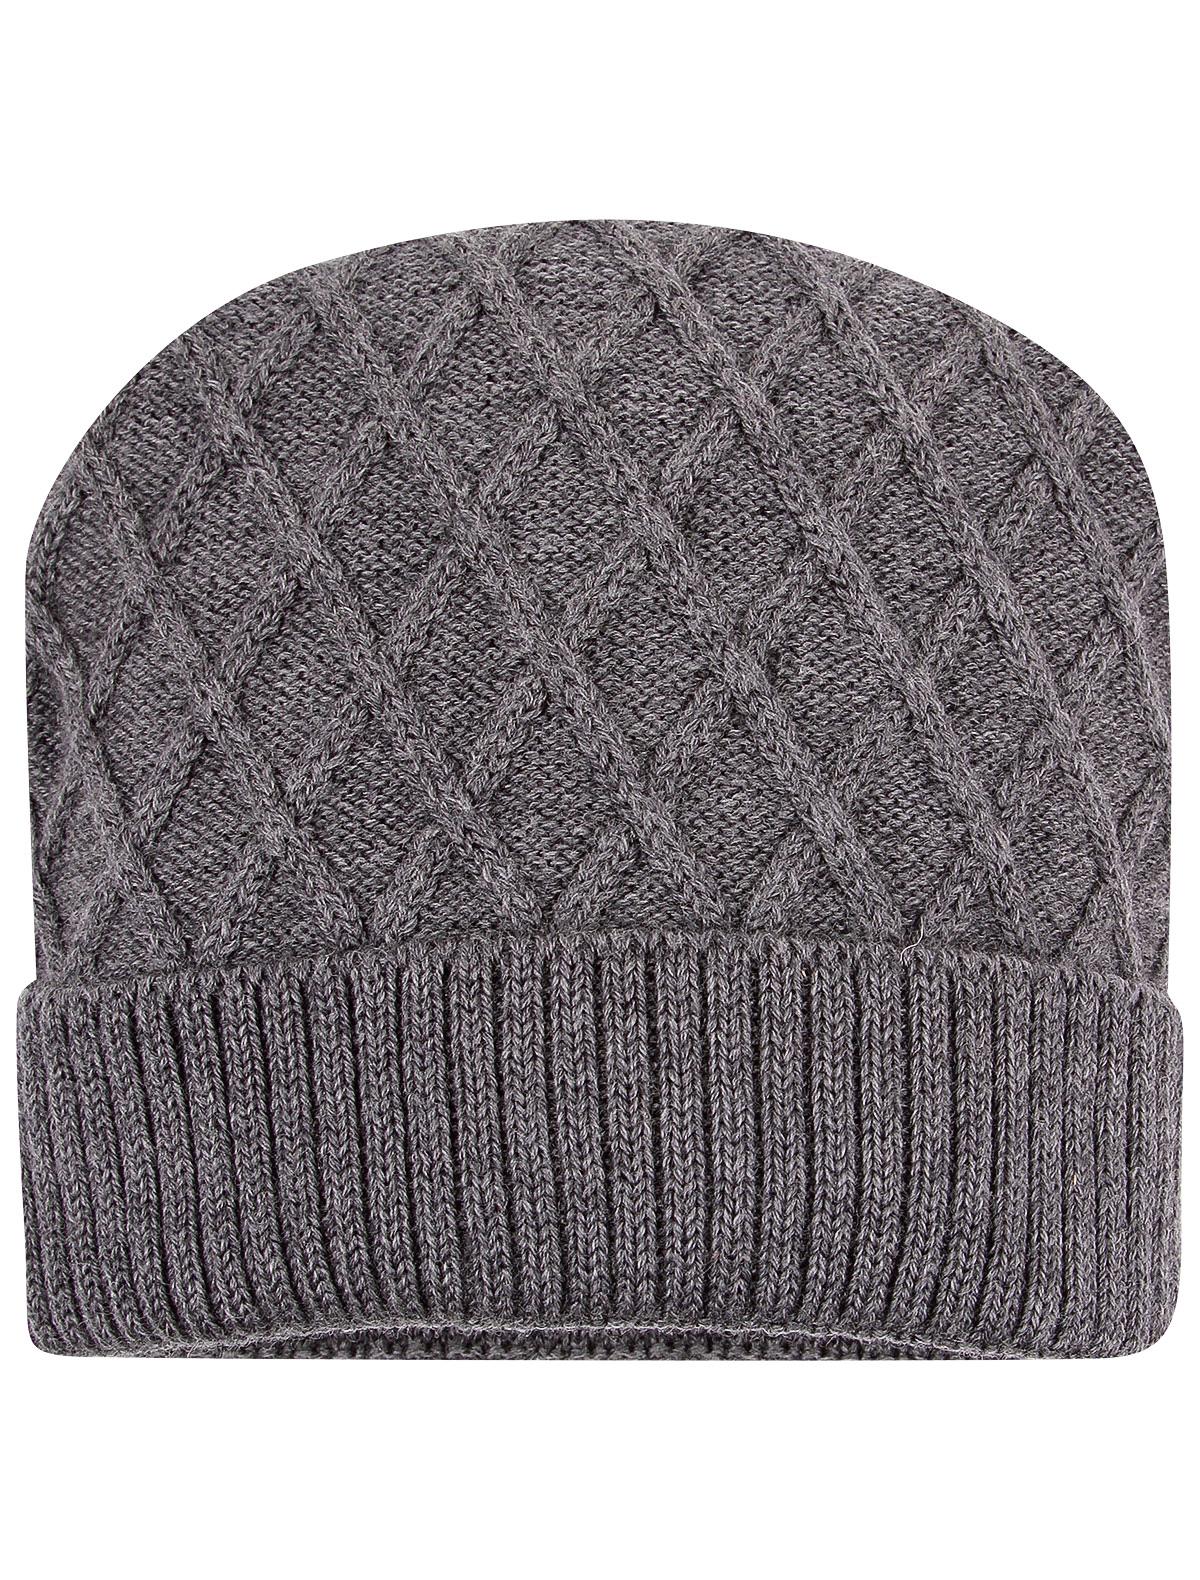 Купить 2249815, Шапка Air wool, серый, 1354528080051